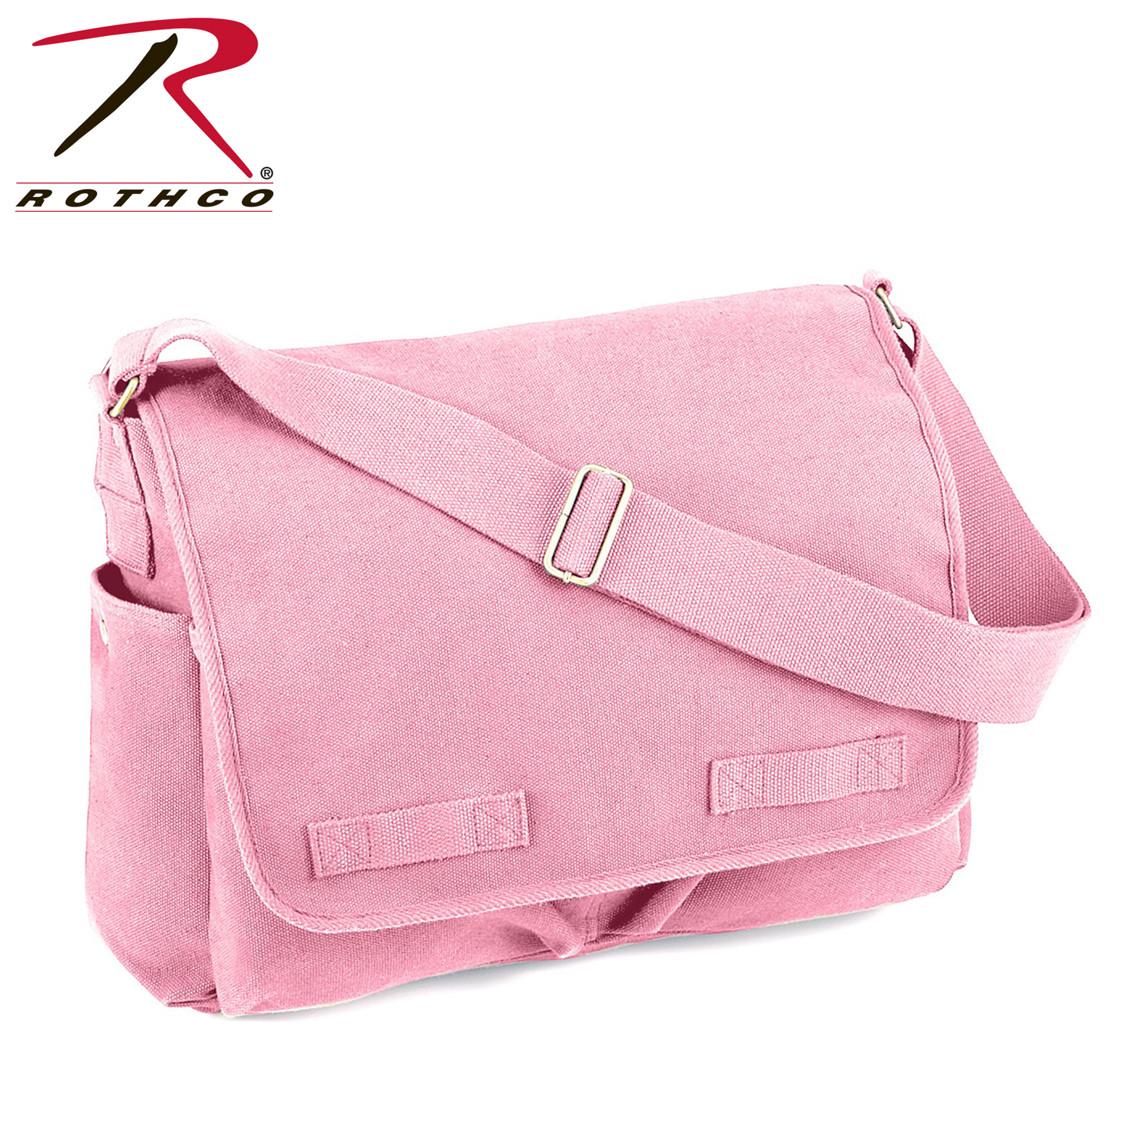 c1c332141 Shop Vintage Pink Canvas Messenger Bags - Fatigues Army Navy Gear